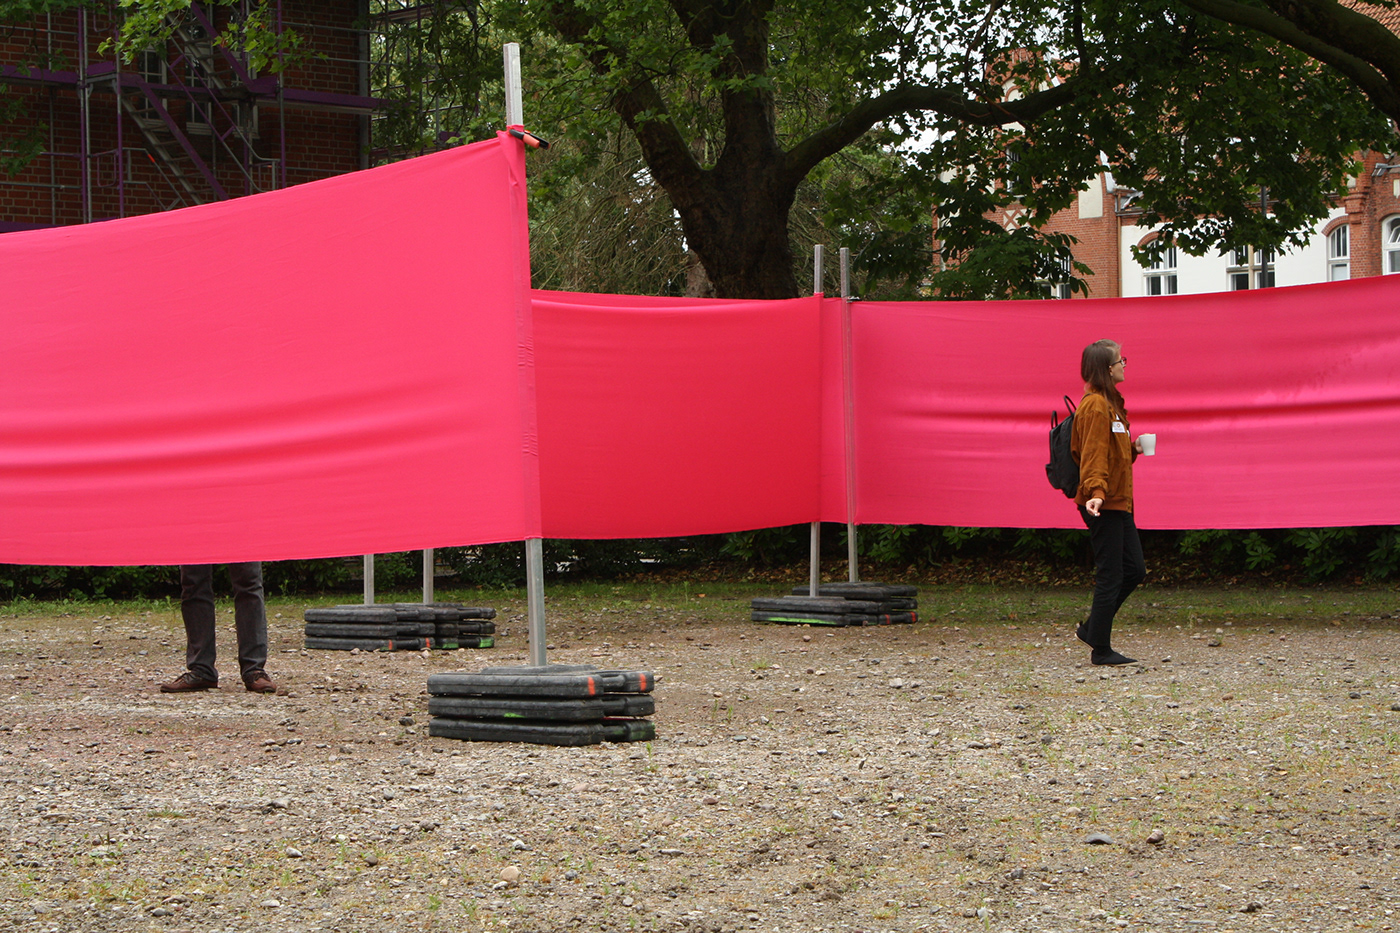 installation Urban space city planning UrbCulturalPlanning Performance